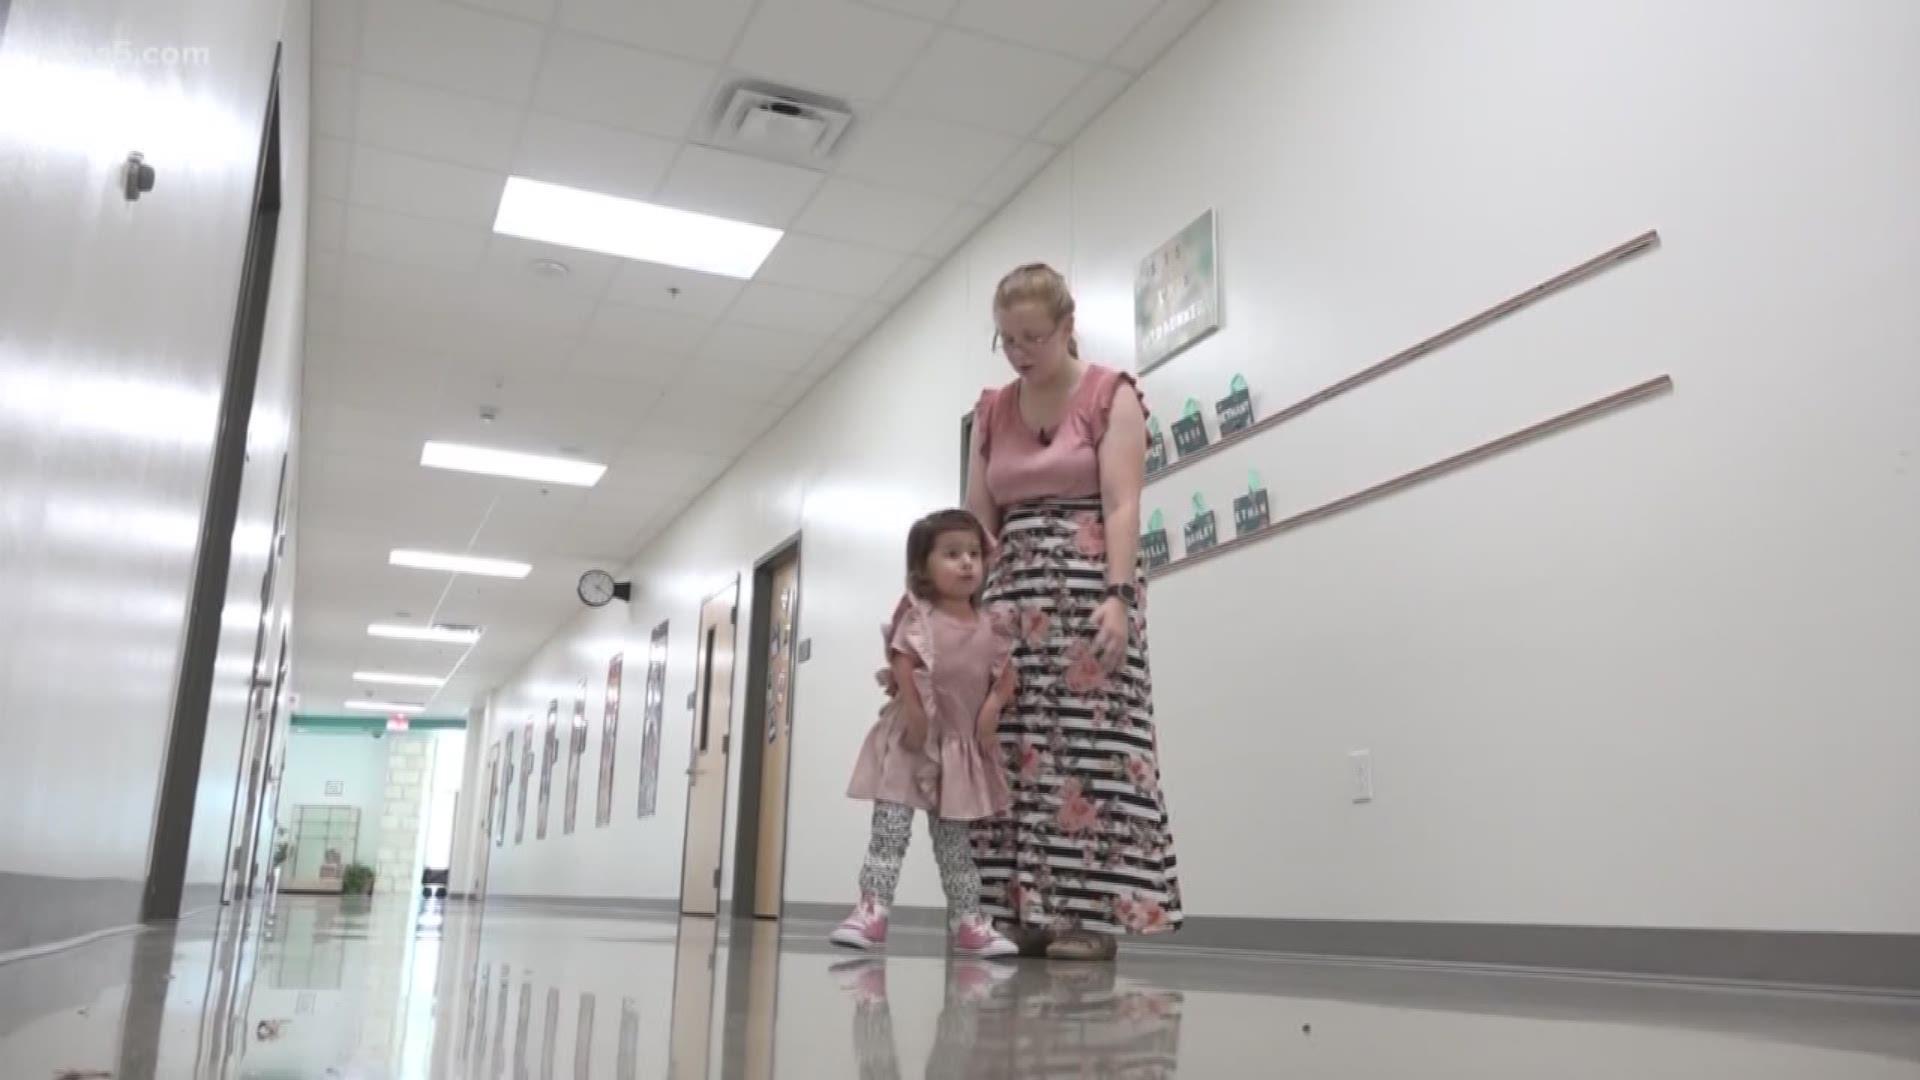 Boerne Preschooler Takes Her First Solo Steps At School Kens5 Com